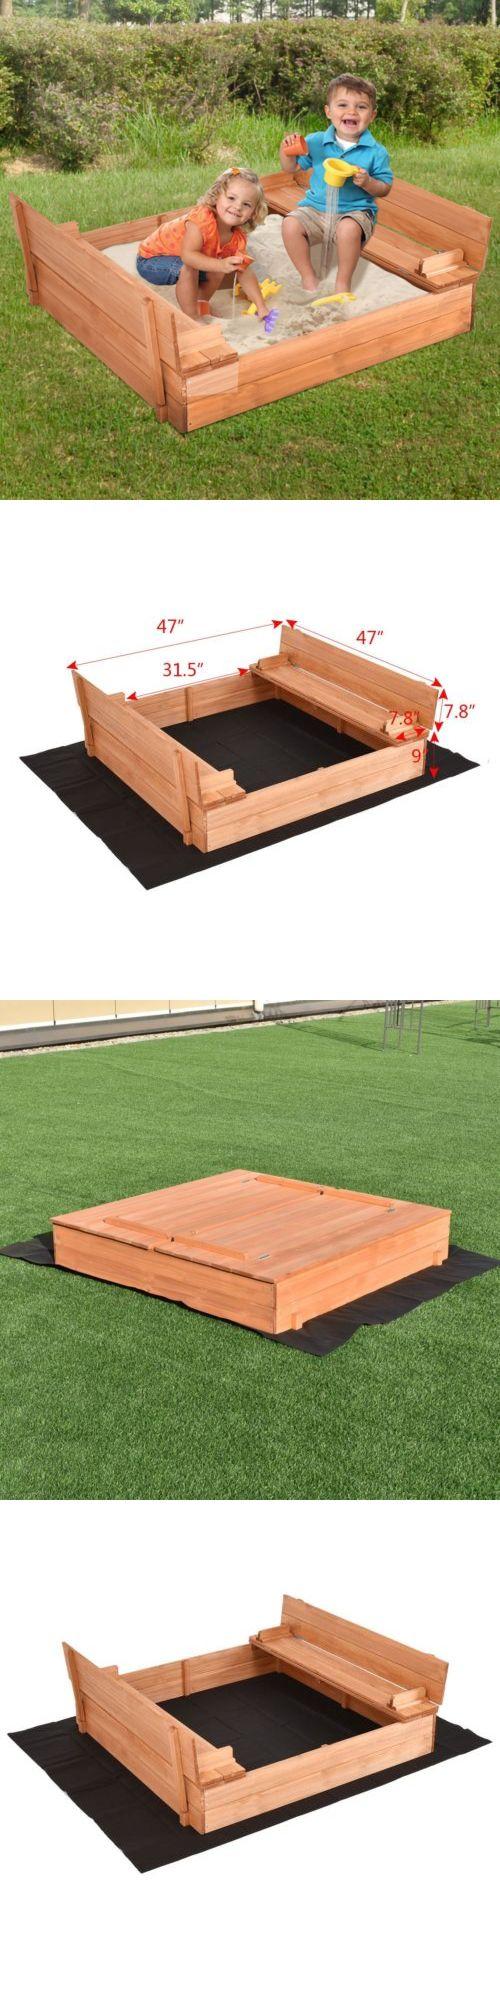 best 25 wooden sandbox ideas on pinterest sandbox with lid